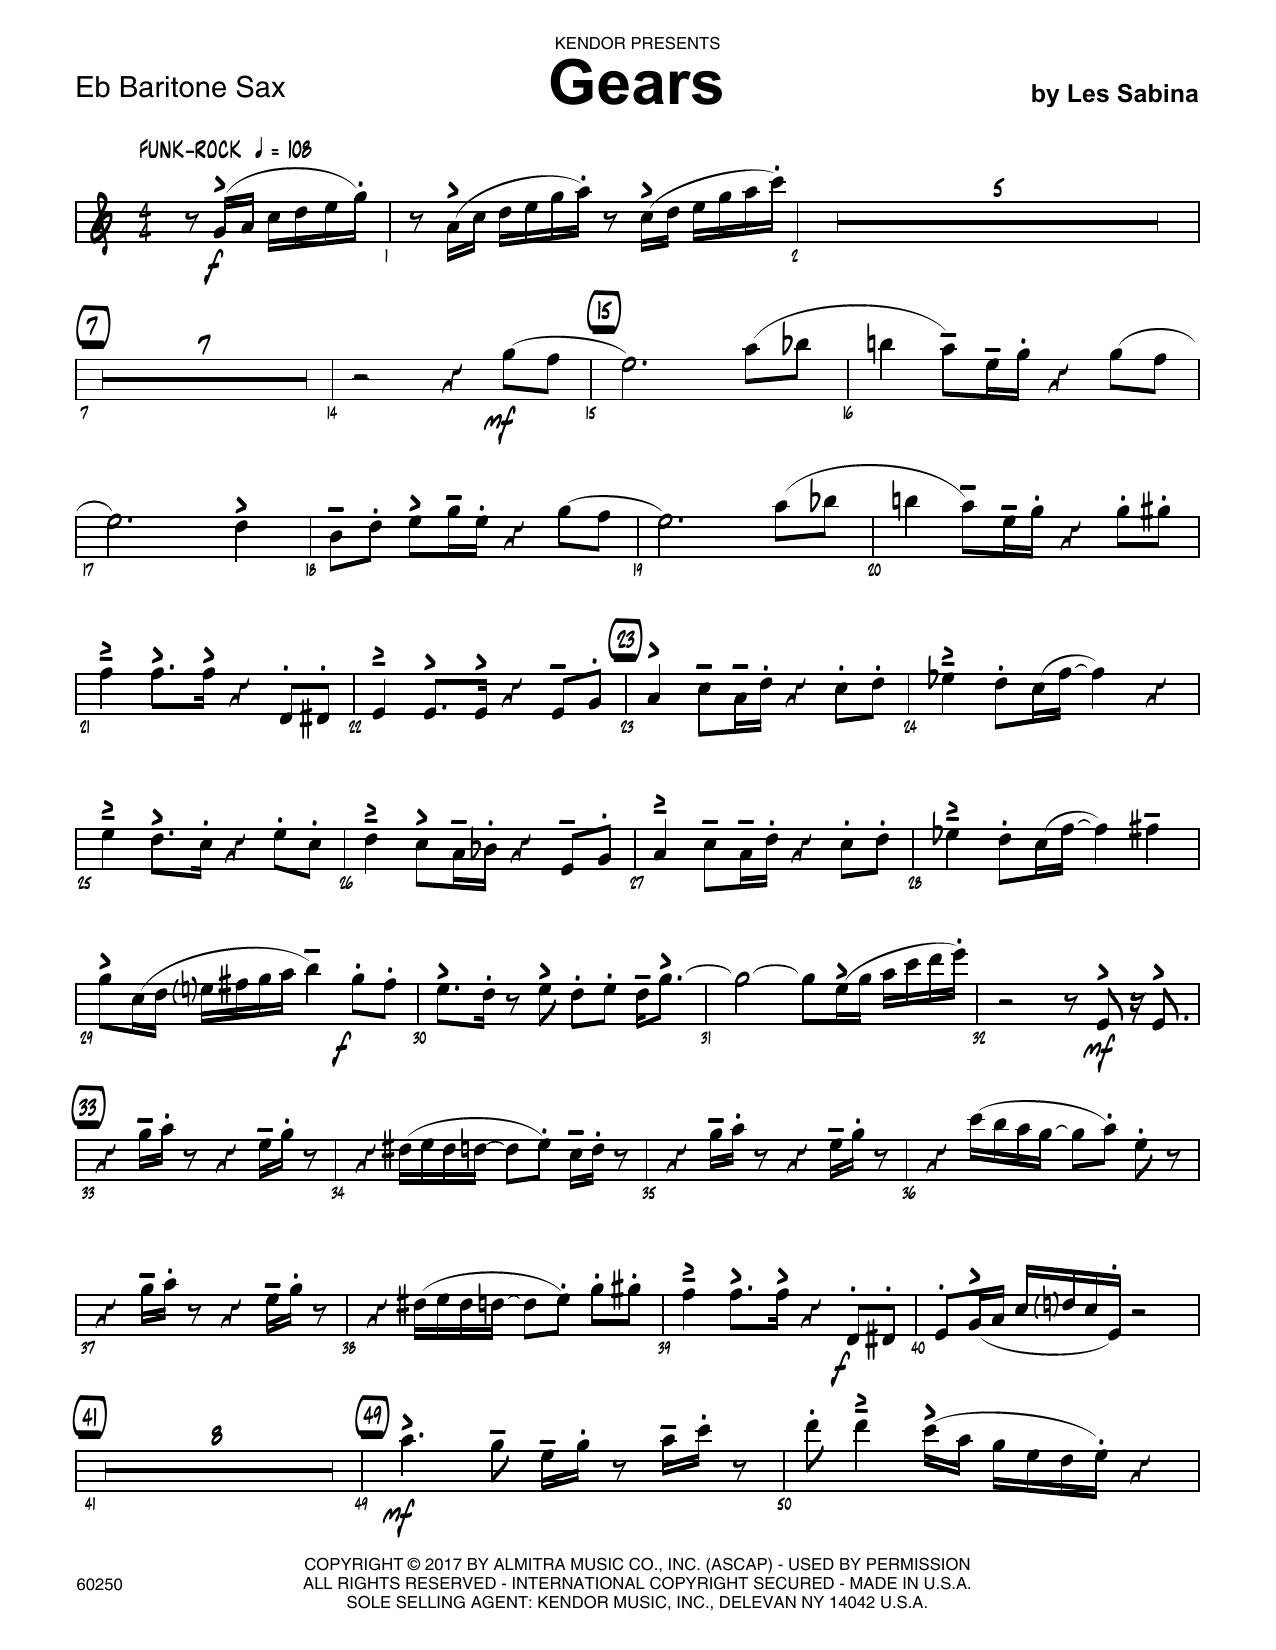 Les Sabina Gears - Eb Baritone Saxophone sheet music notes printable PDF score